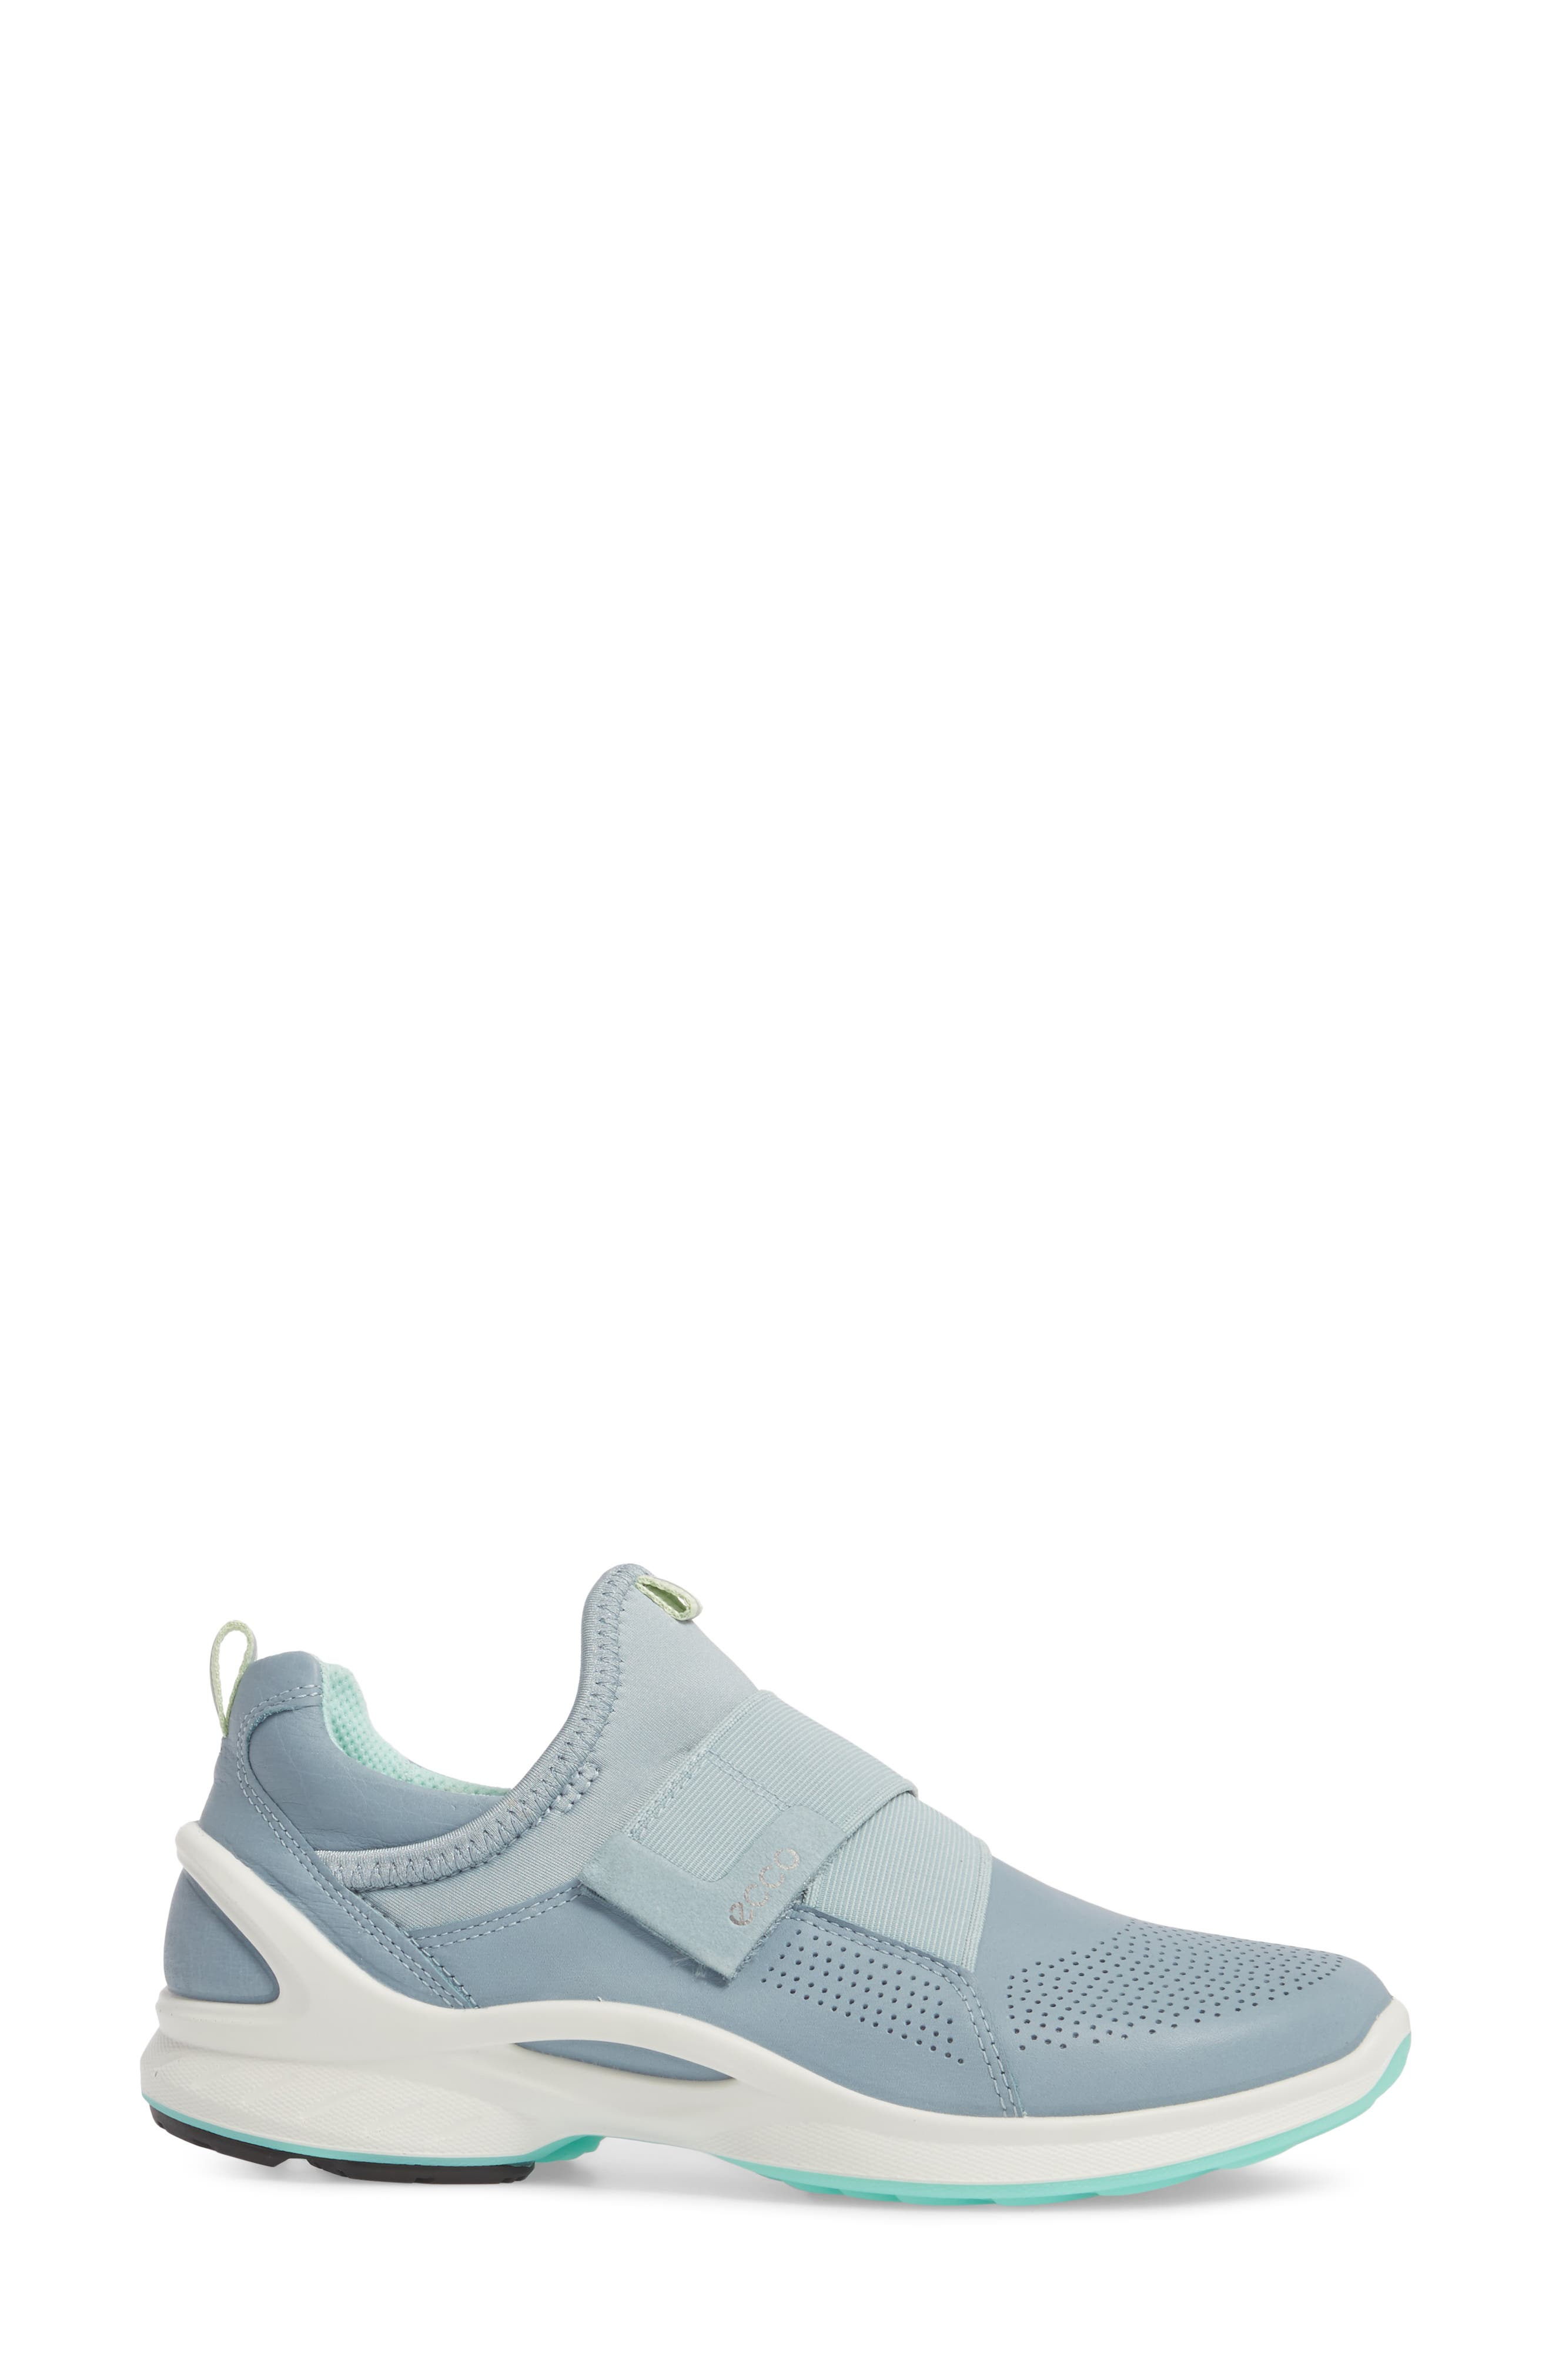 BIOM Fjuel Band Sneaker,                             Alternate thumbnail 3, color,                             Arona Fabric